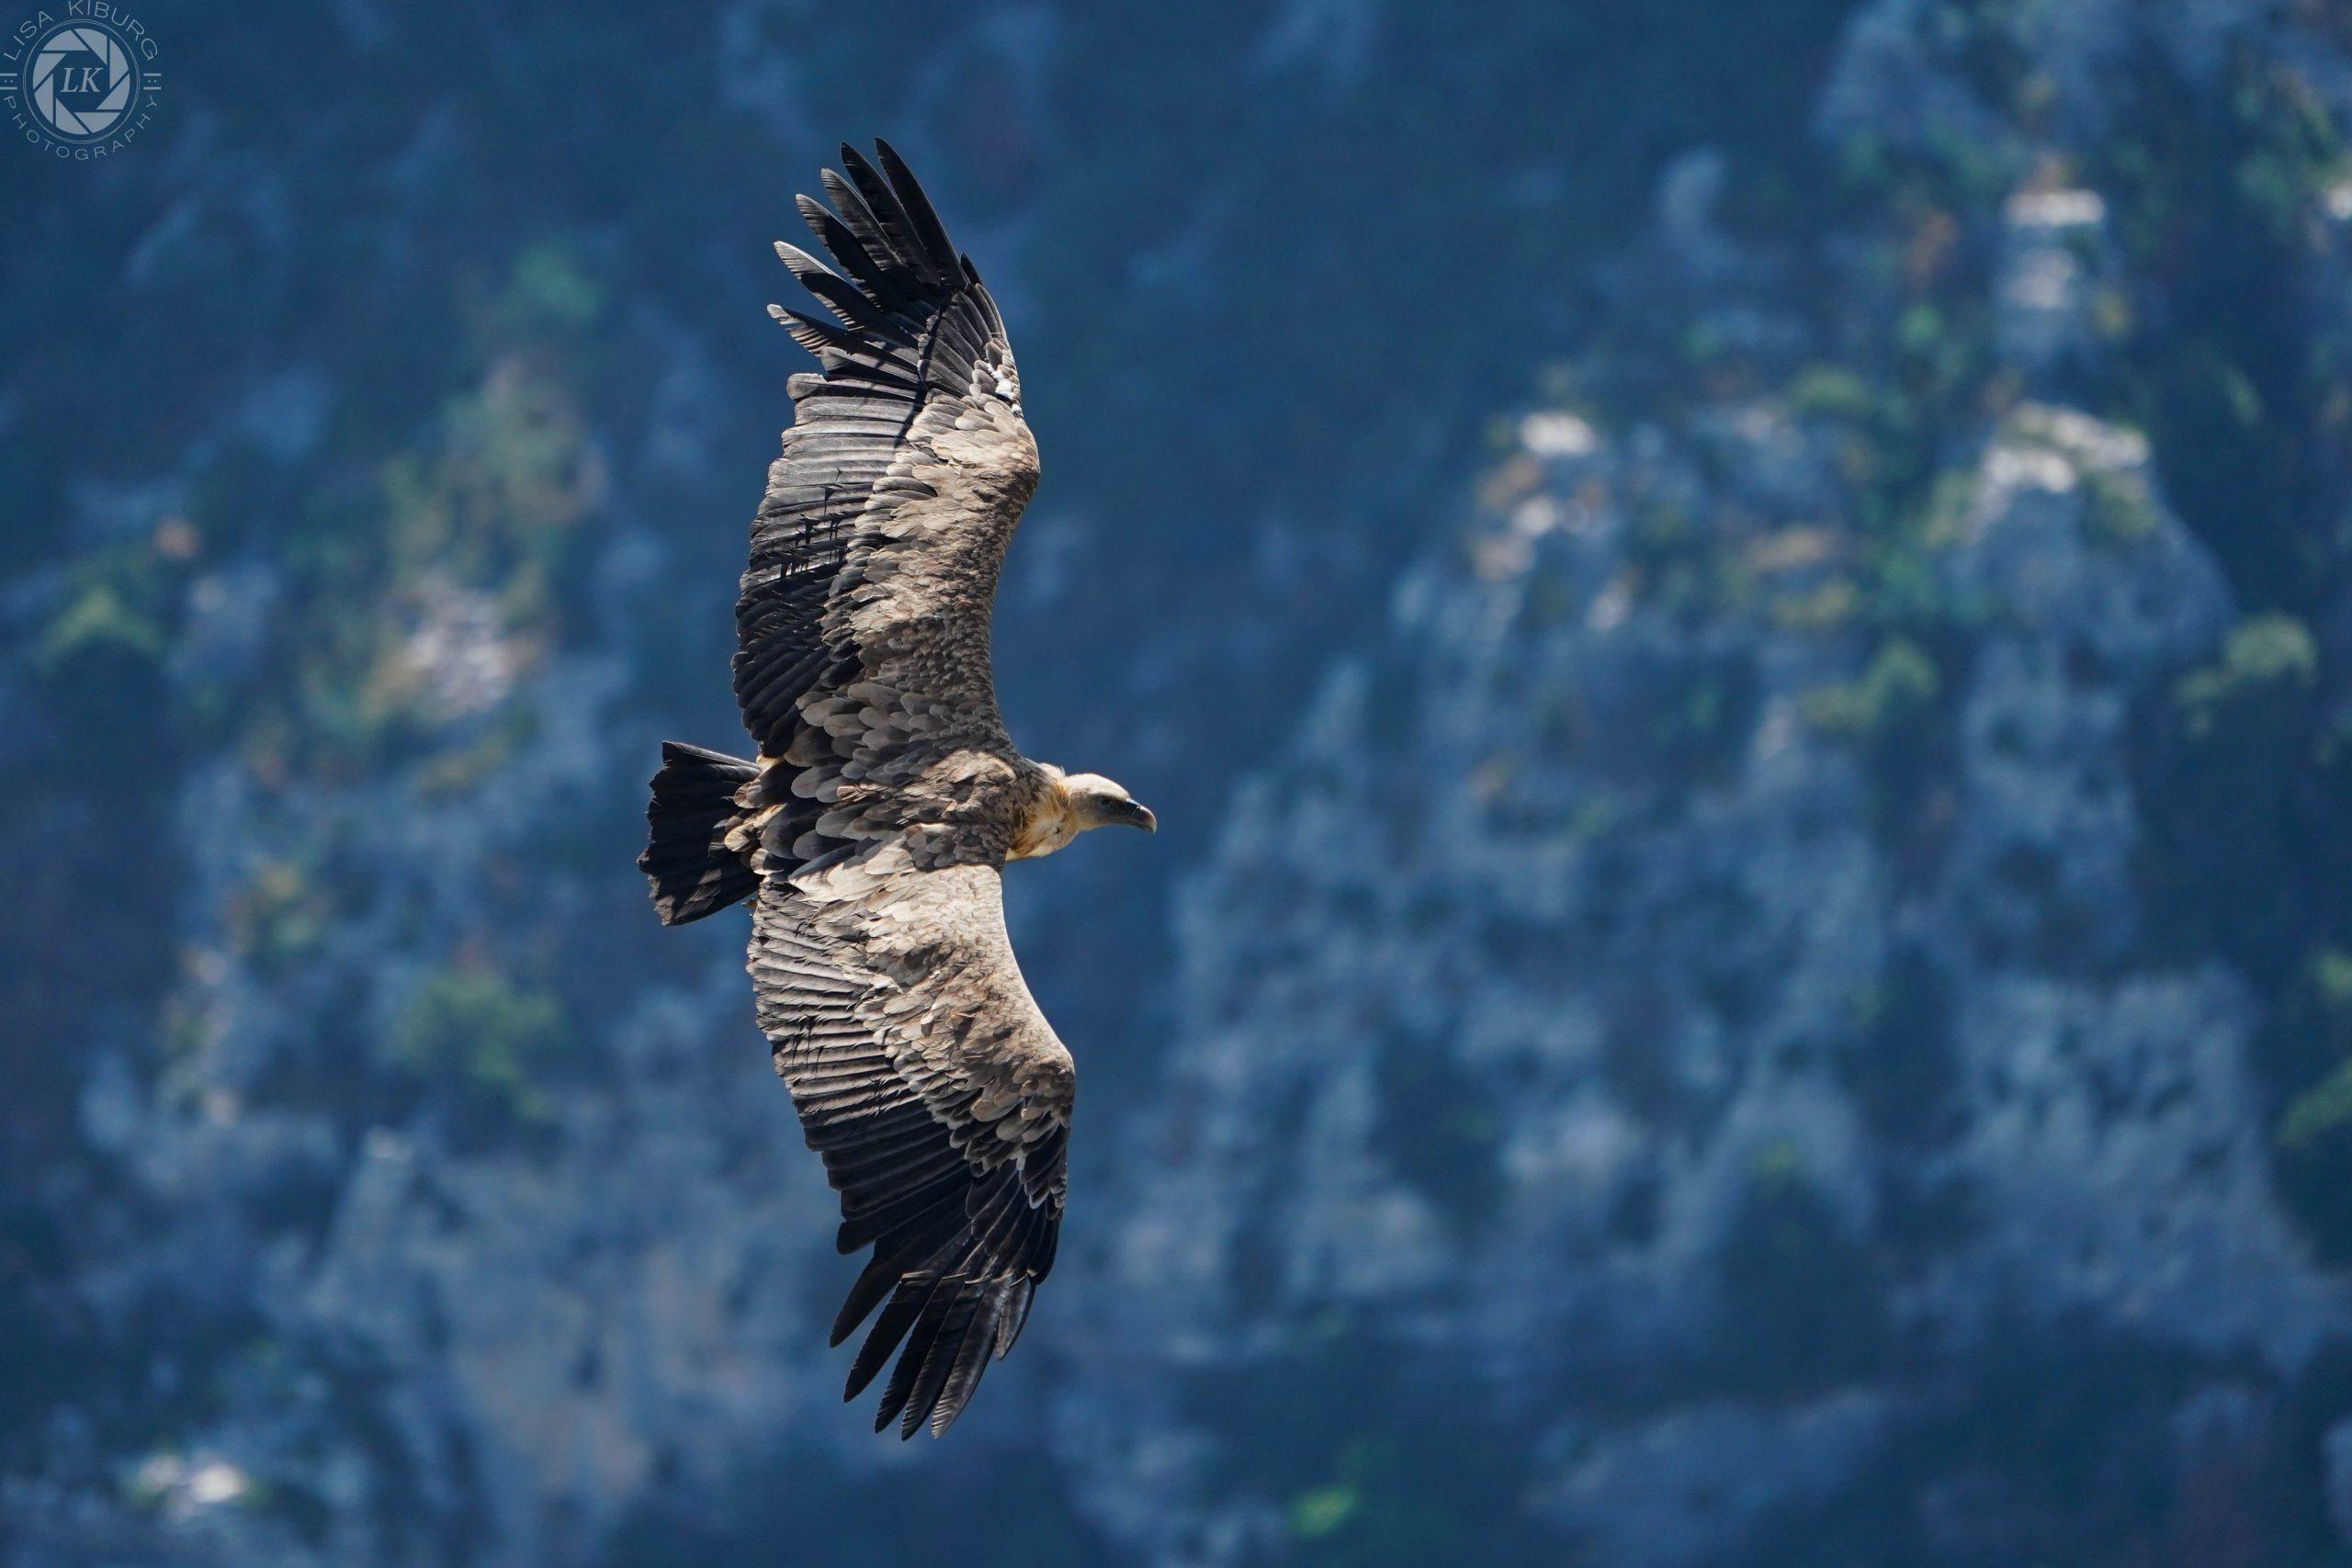 Vulture in flight